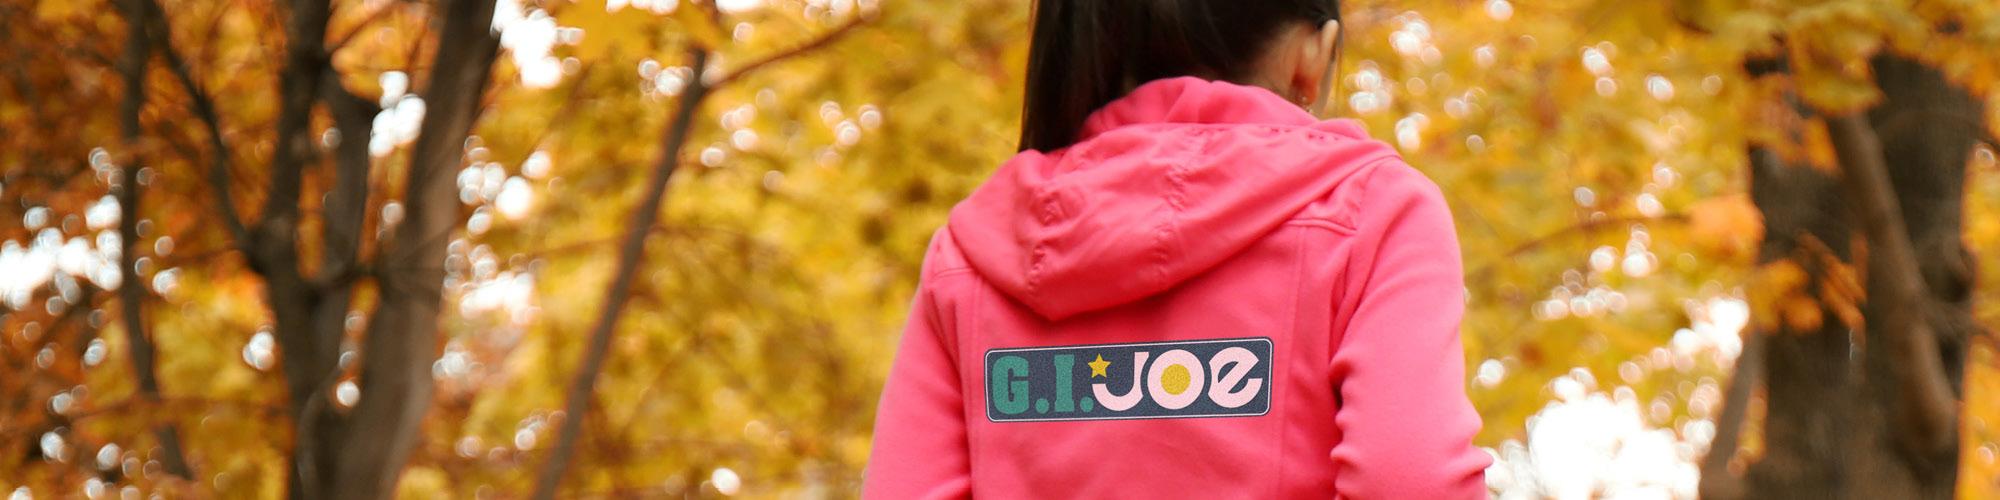 Joe gijoe caroussel 7